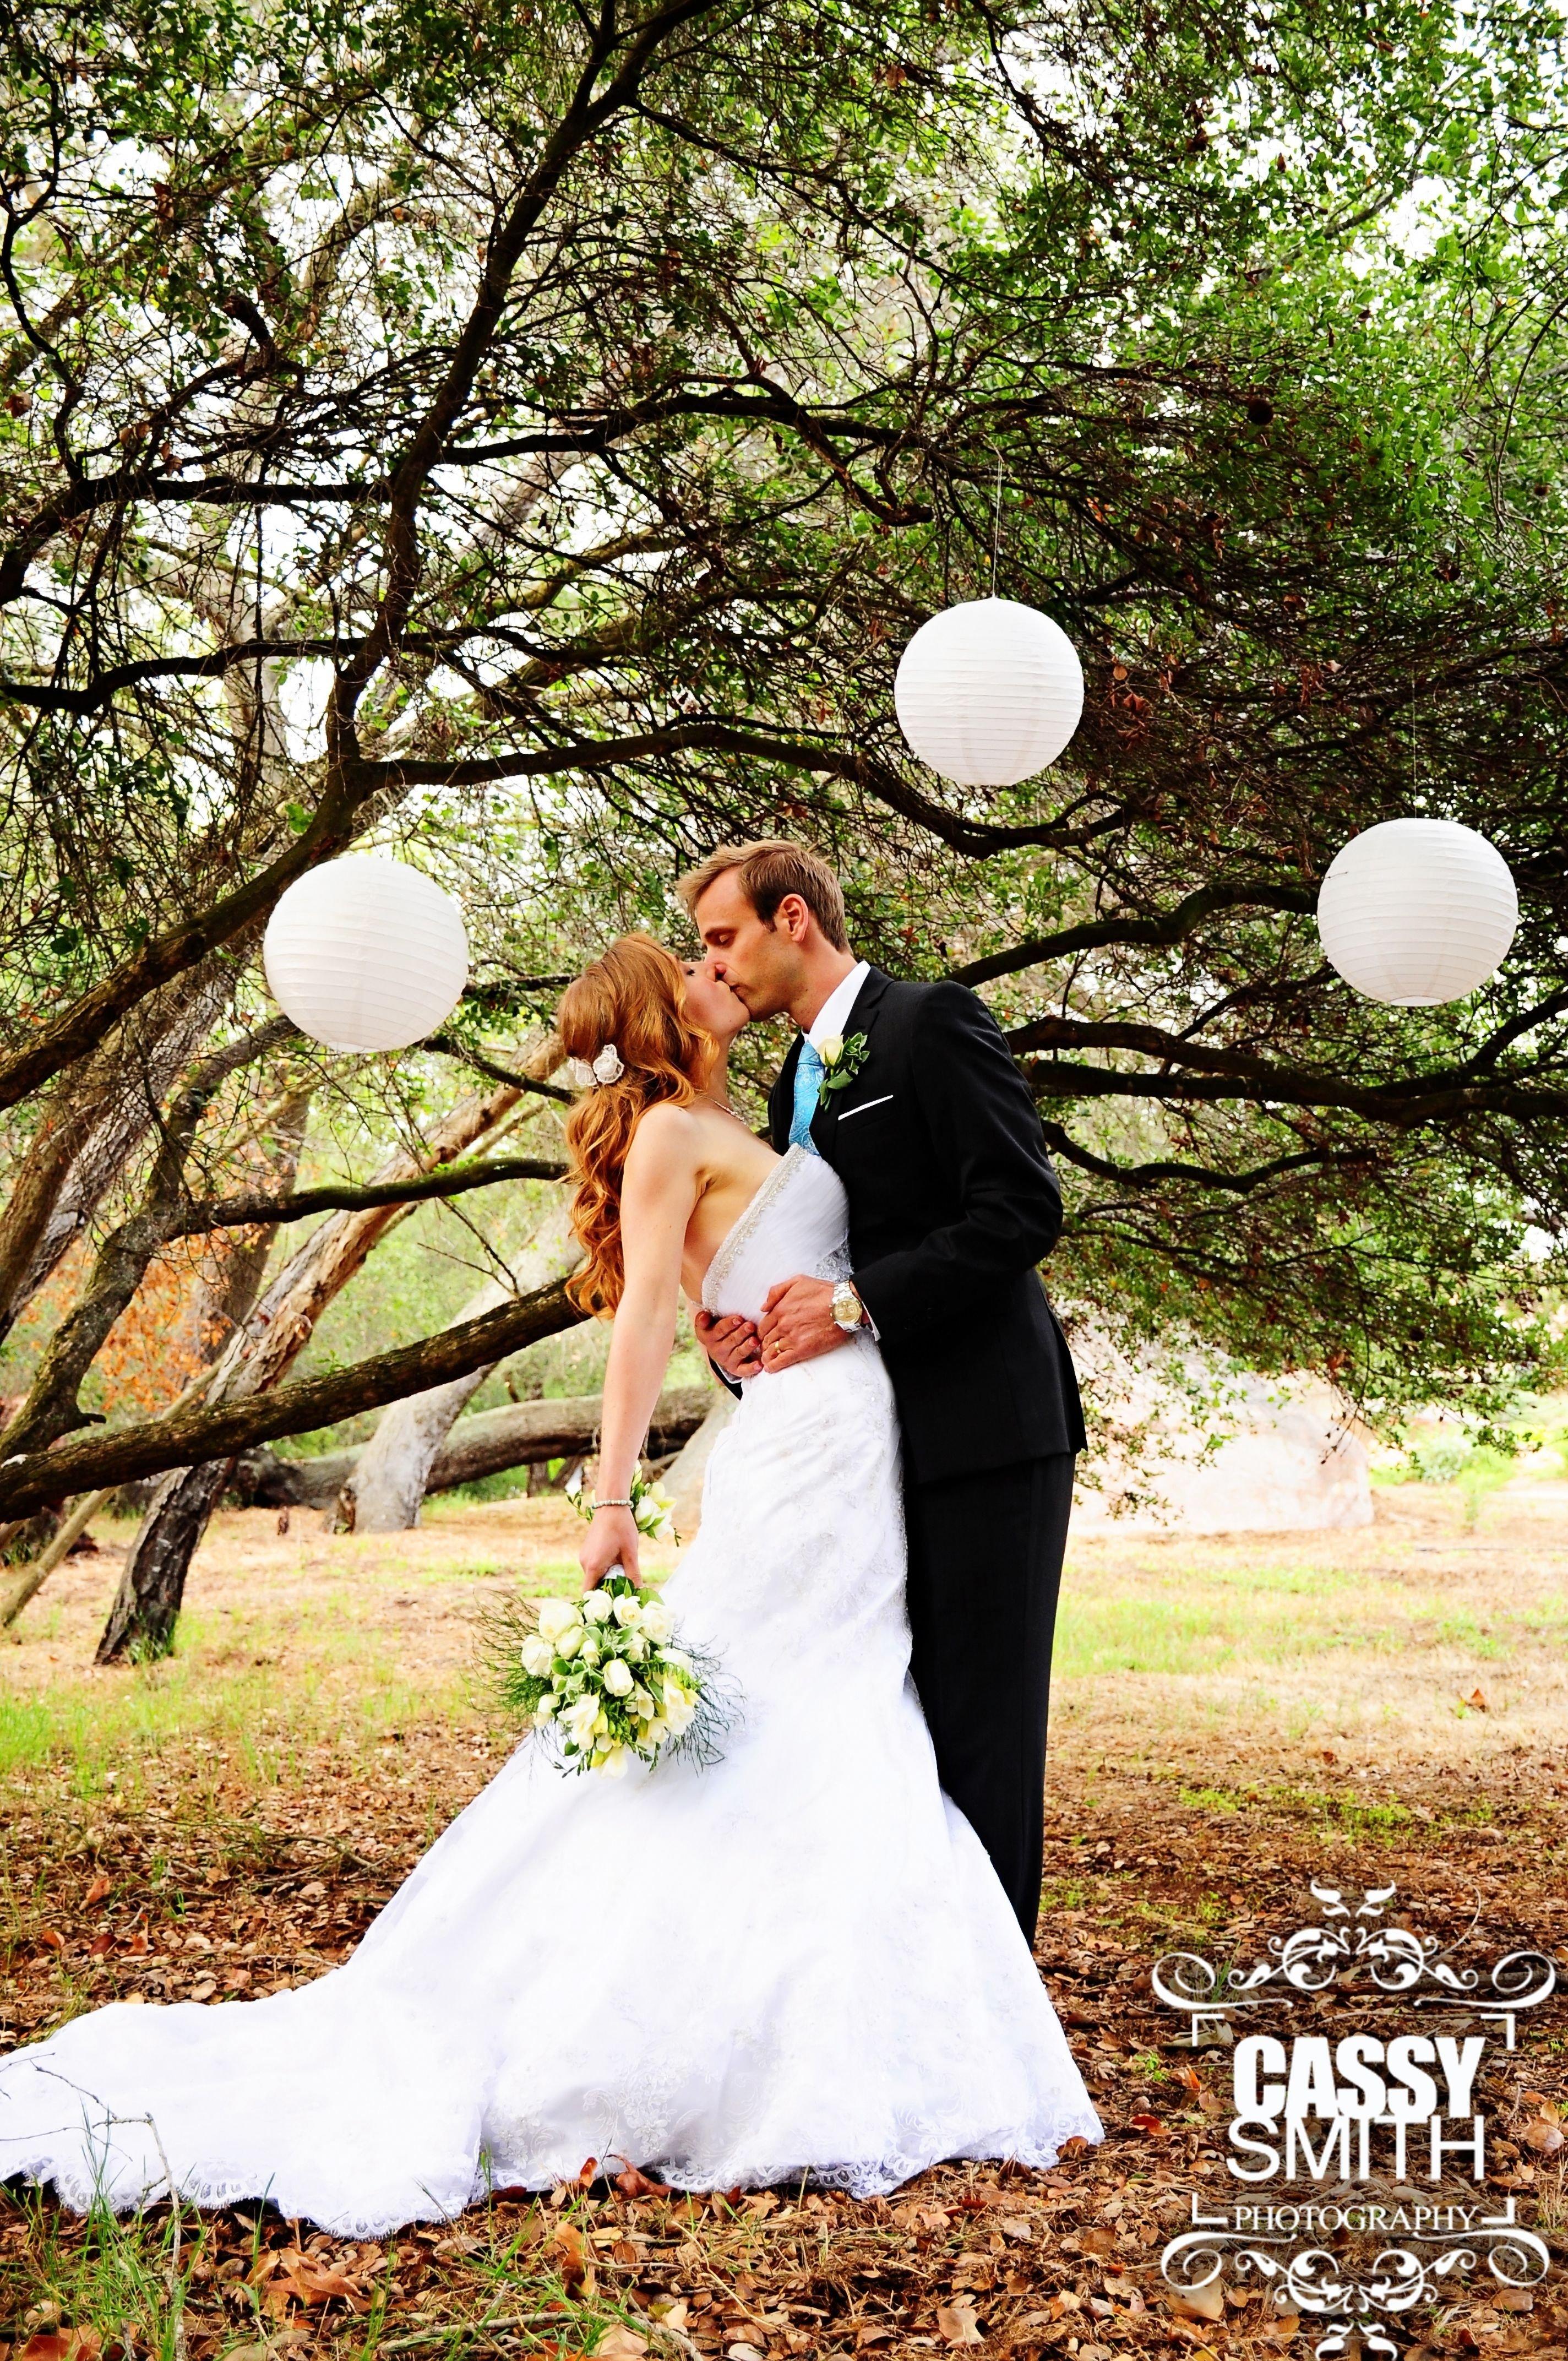 10 Trendy Bride And Groom Picture Ideas california wedding photographer outdoor wedding wedding photo